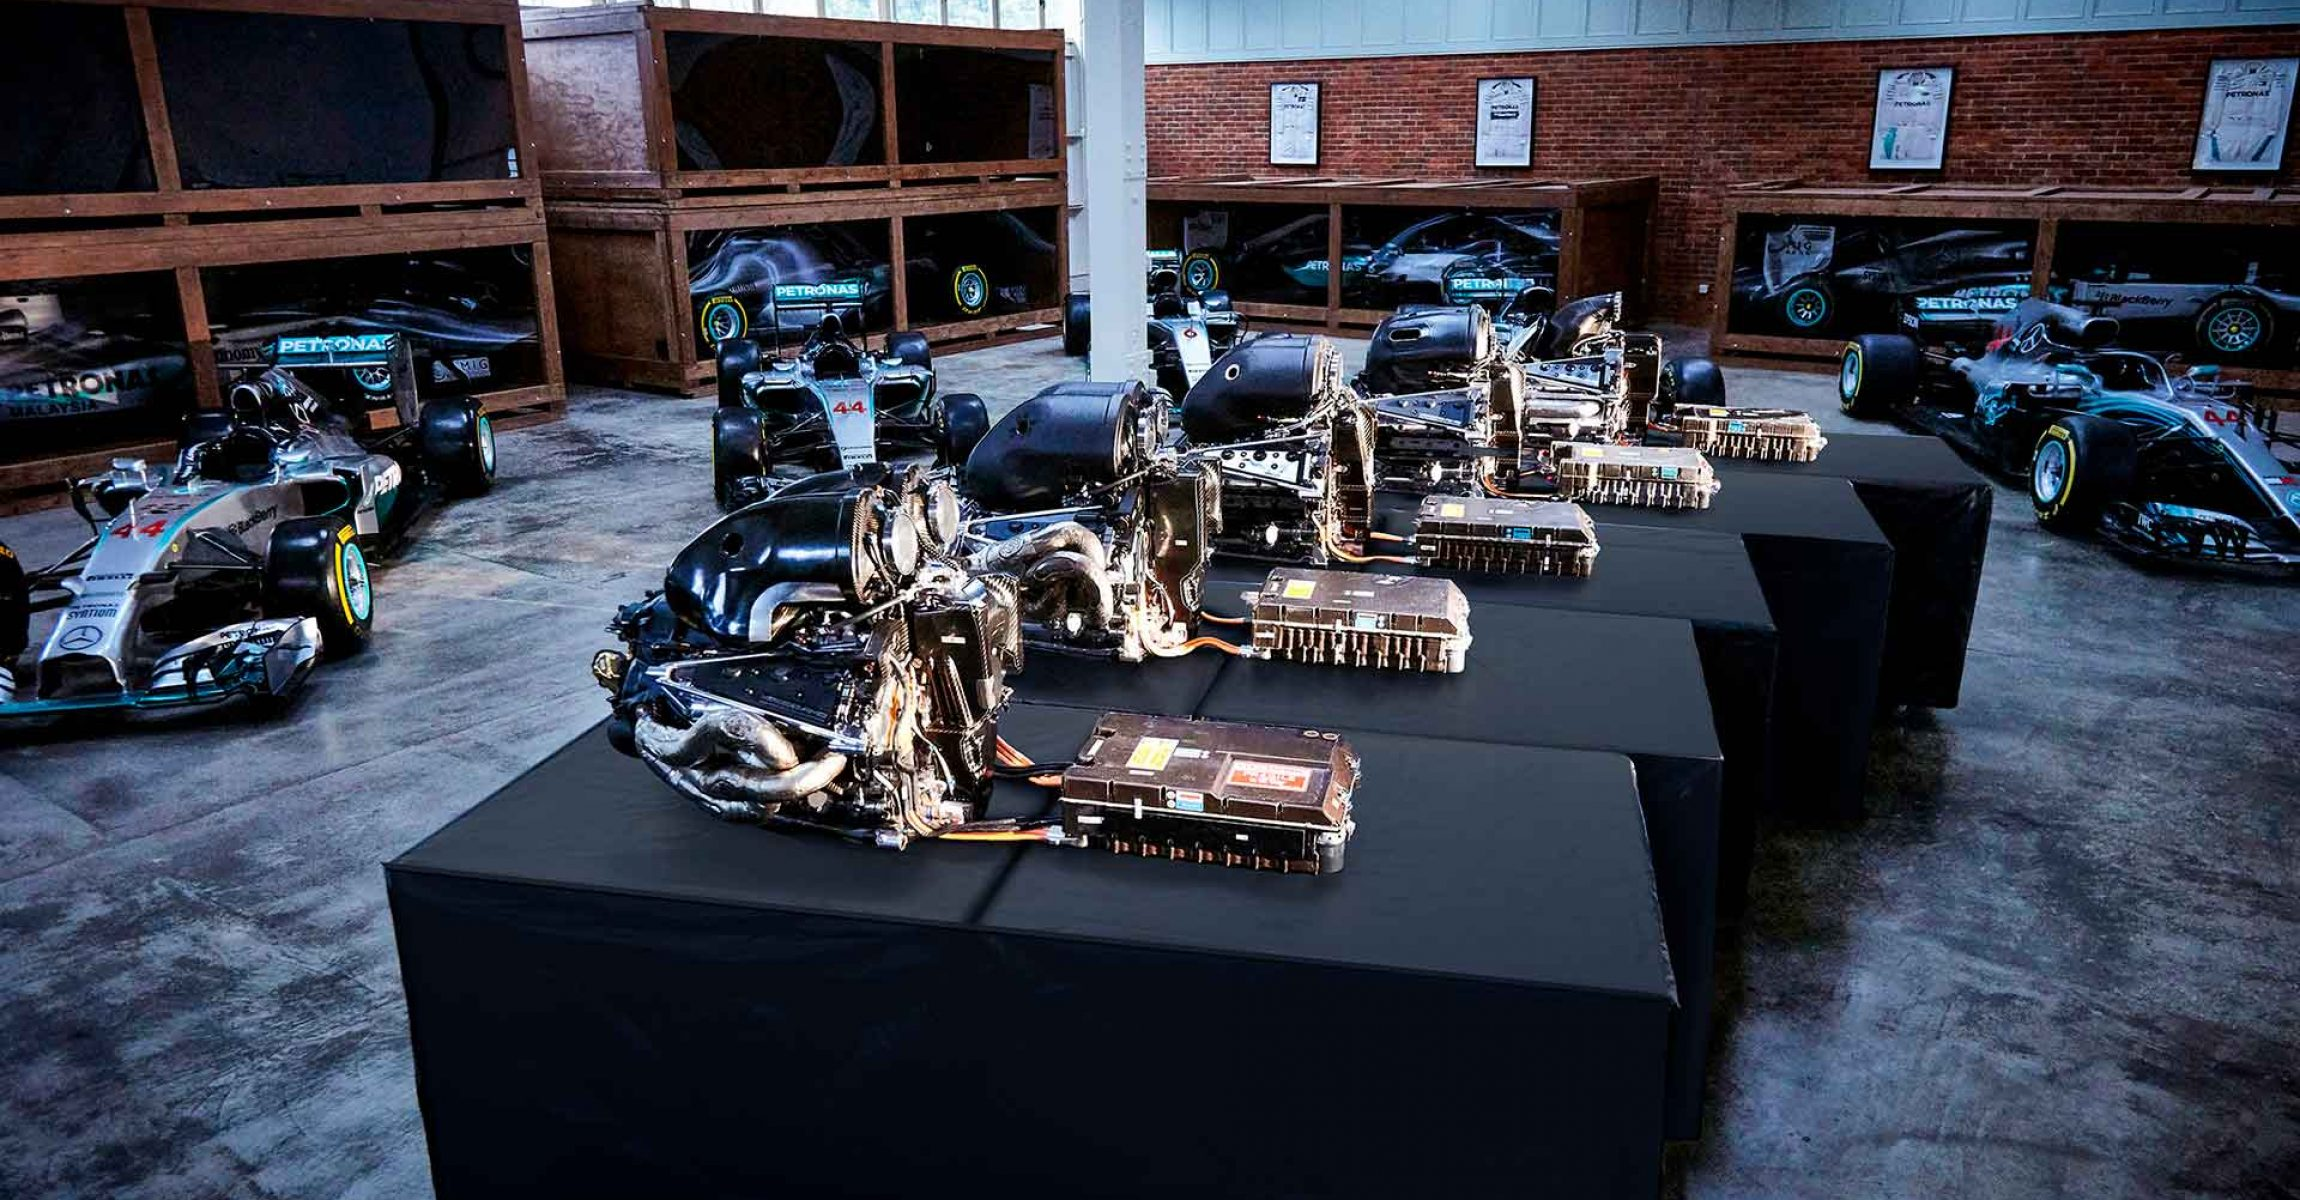 Mercedes V6 hybrid engines